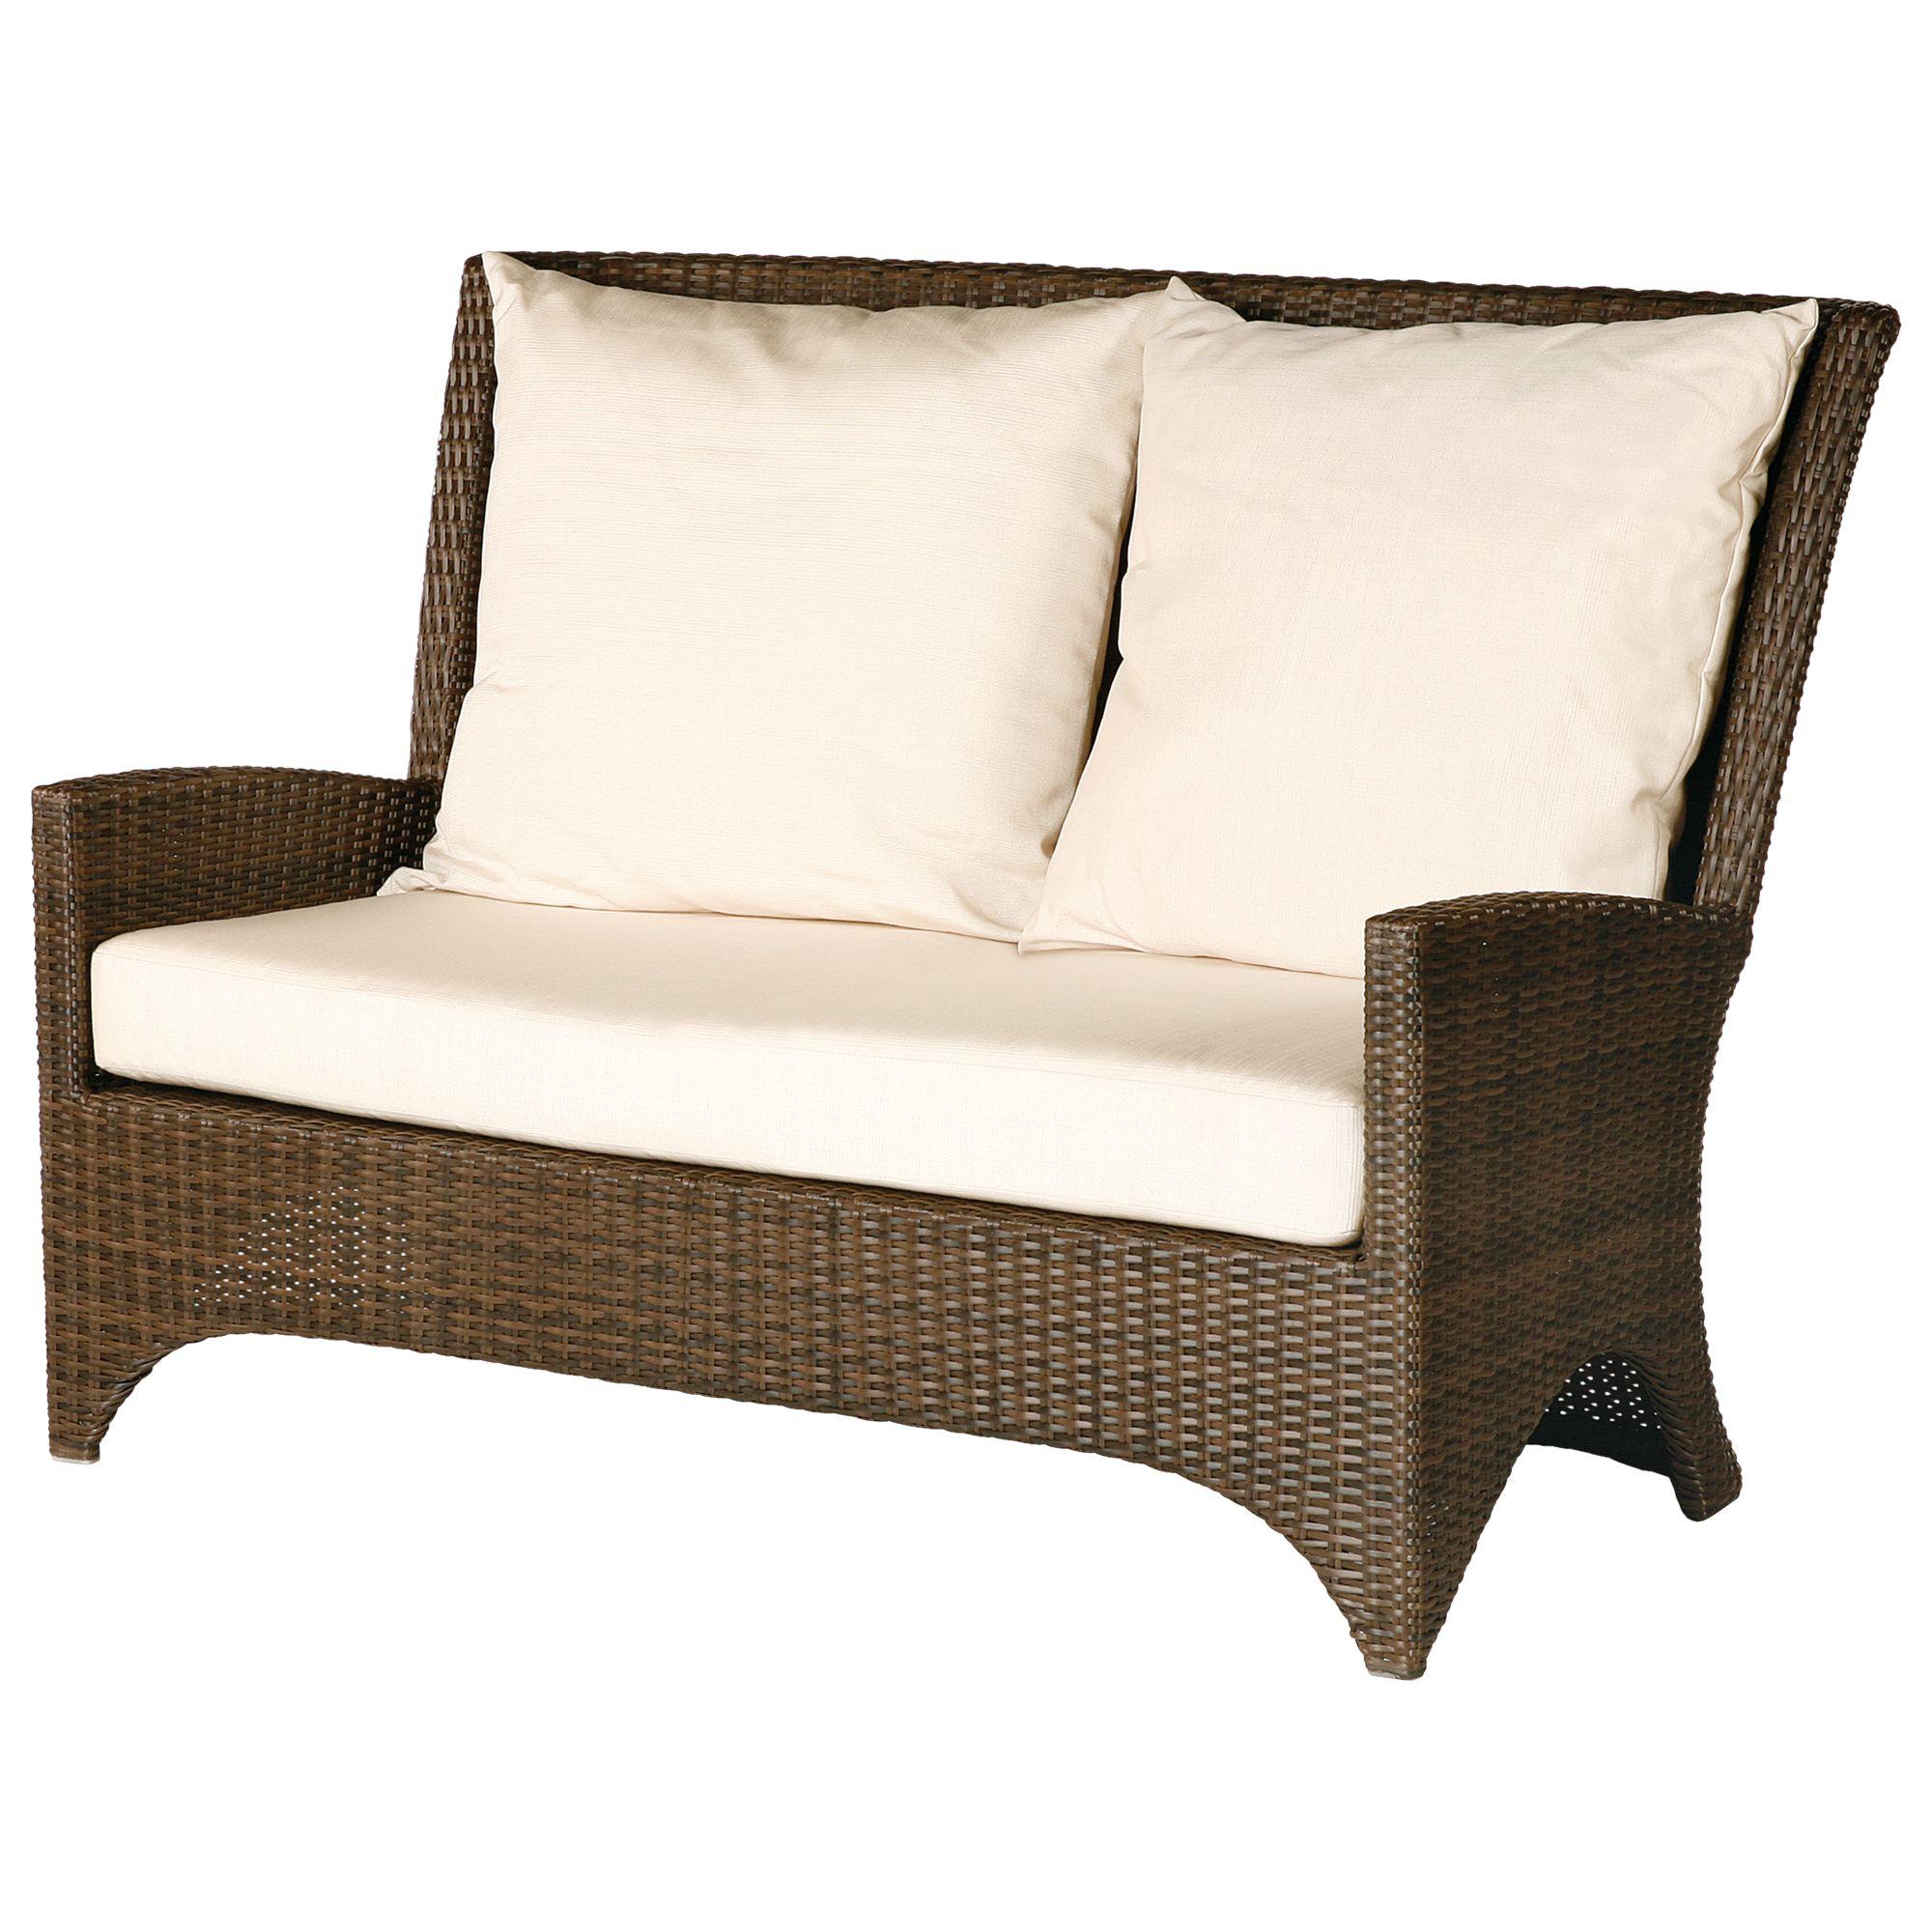 Barlow Tyrie Savannah 2-Seater Outdoor Sofa